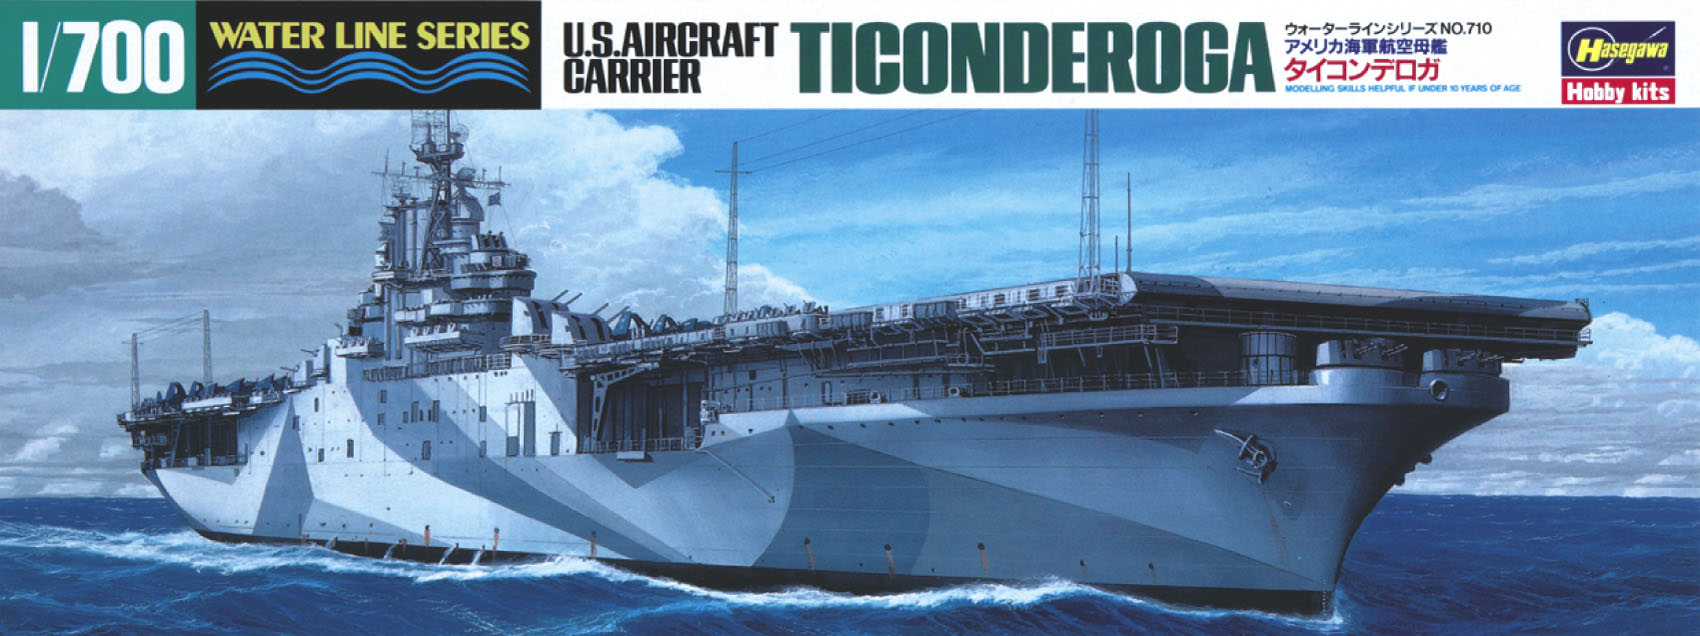 Hasegawa U.S. Aircraft Carrier Ticonderoga